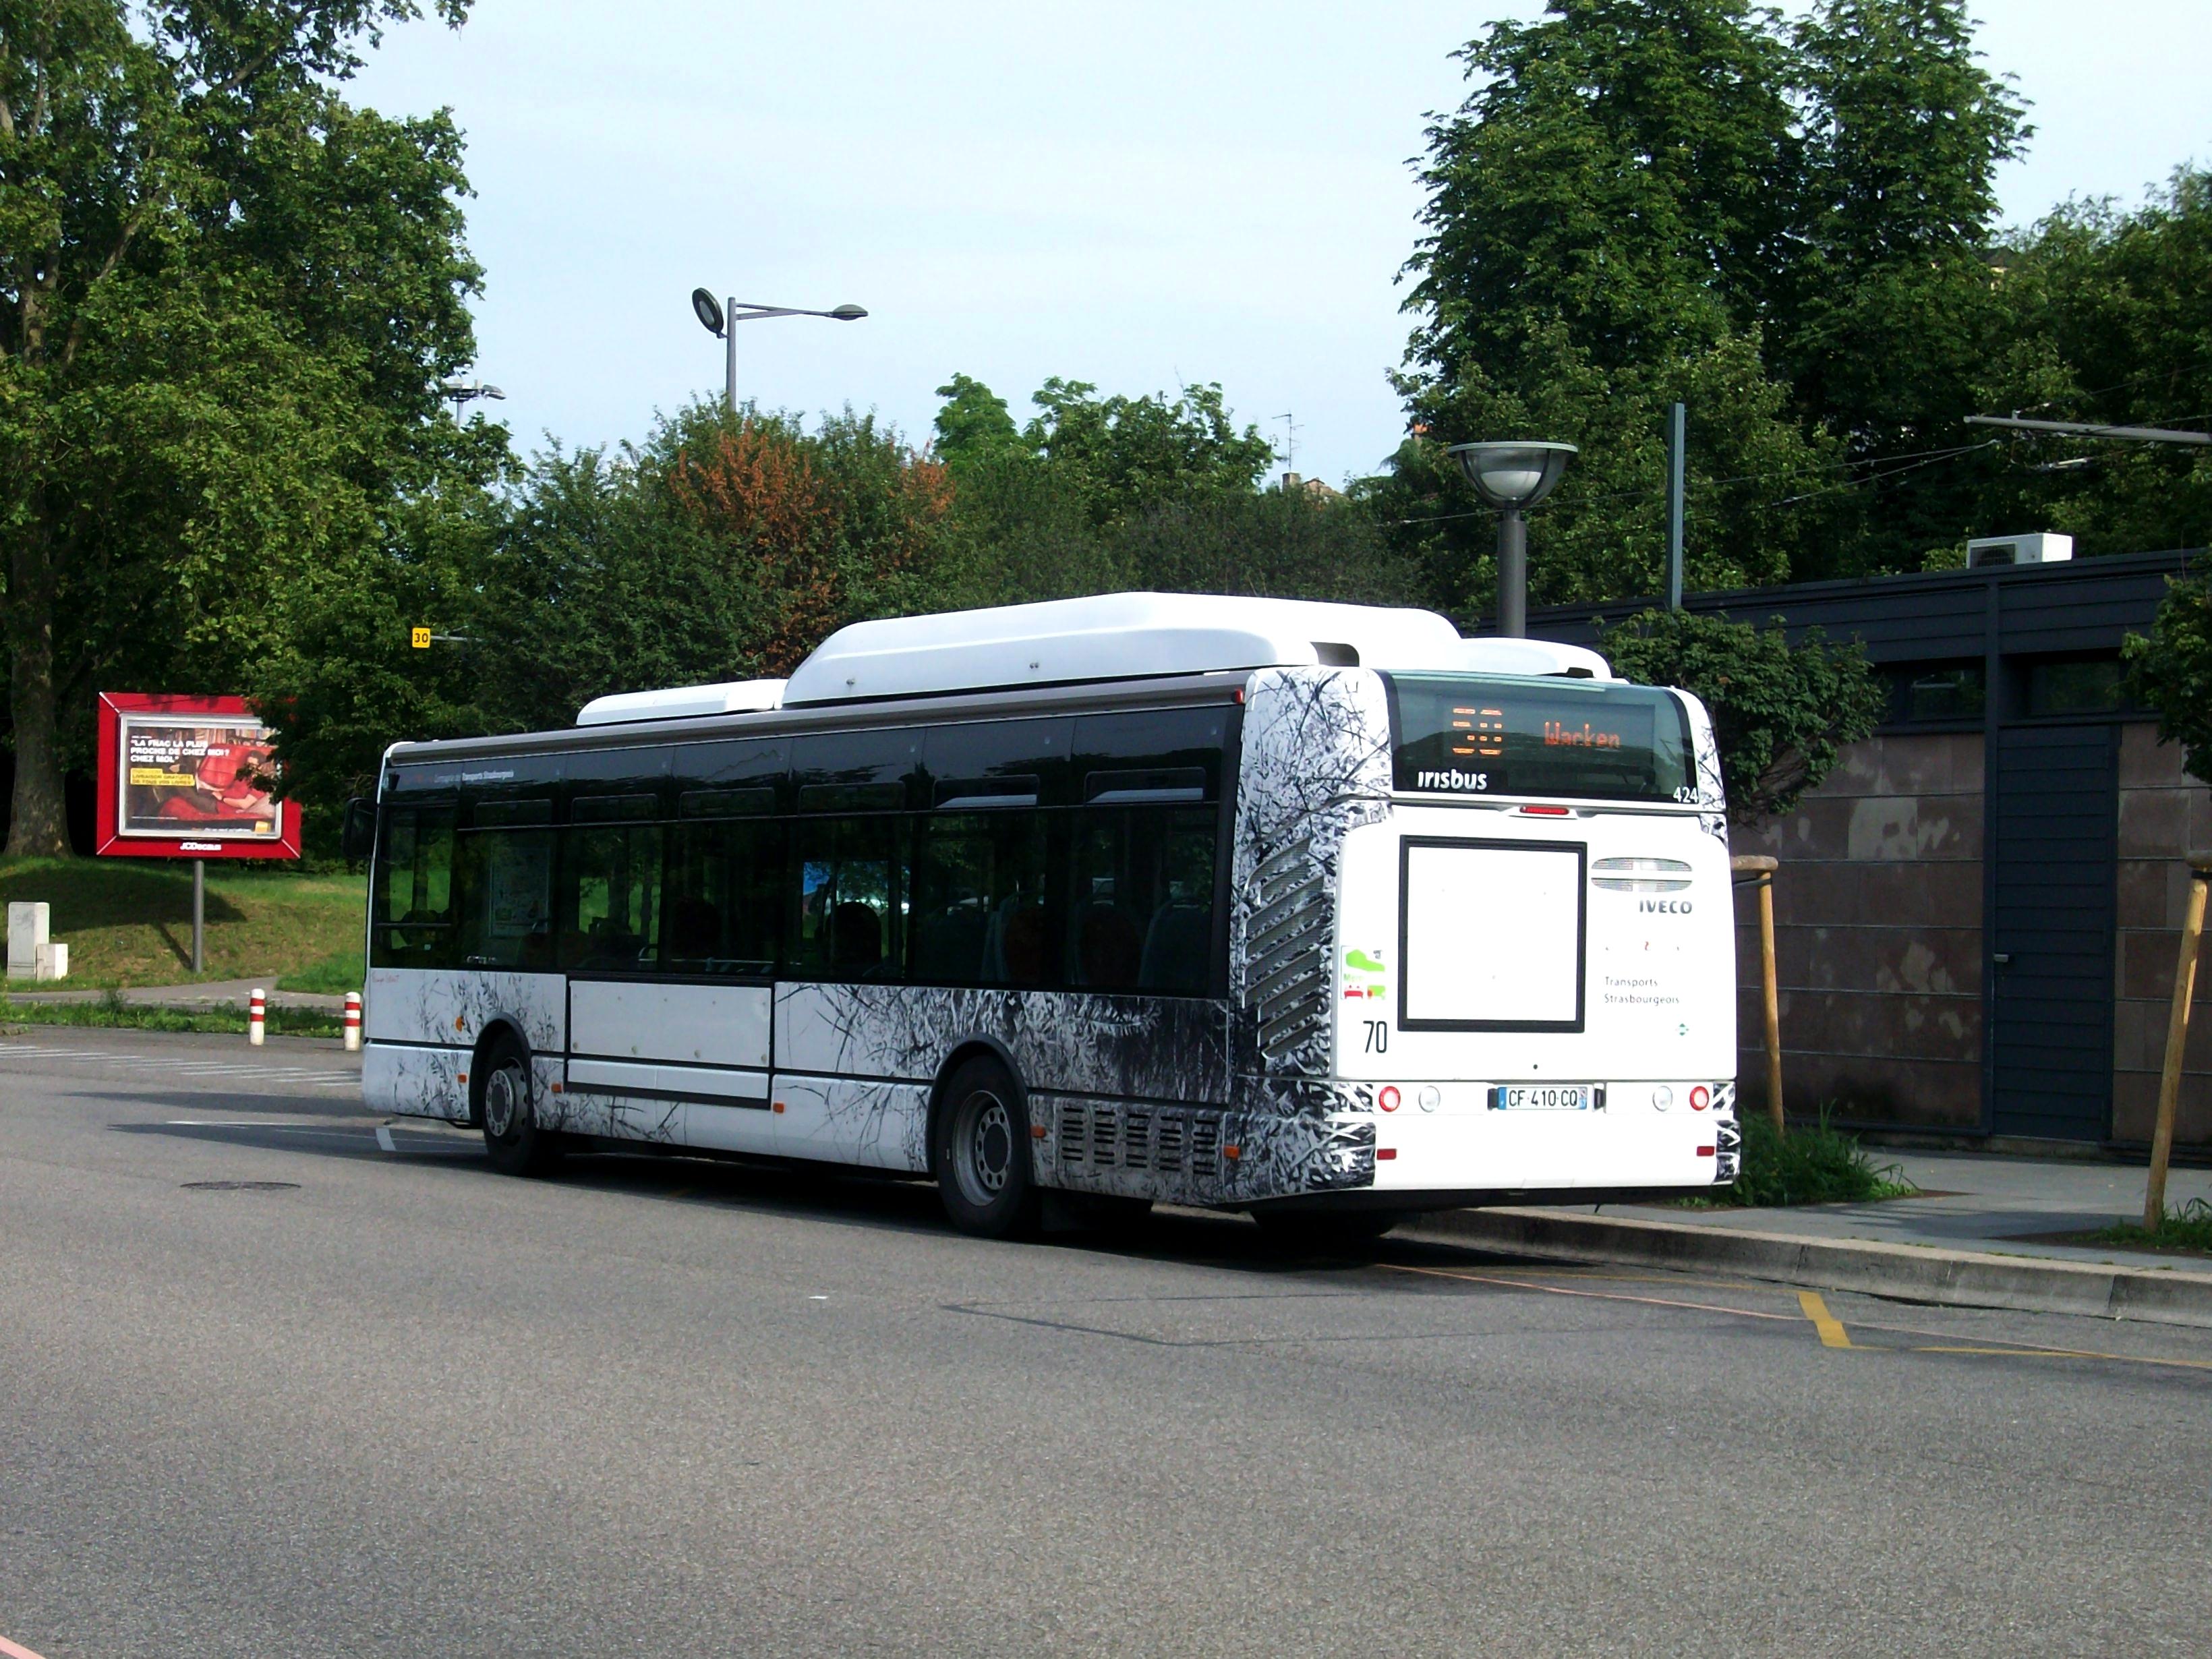 file irisbus citelis 12 gnc n 424 brousailles bus 50 strasbourg jpg wikimedia commons. Black Bedroom Furniture Sets. Home Design Ideas